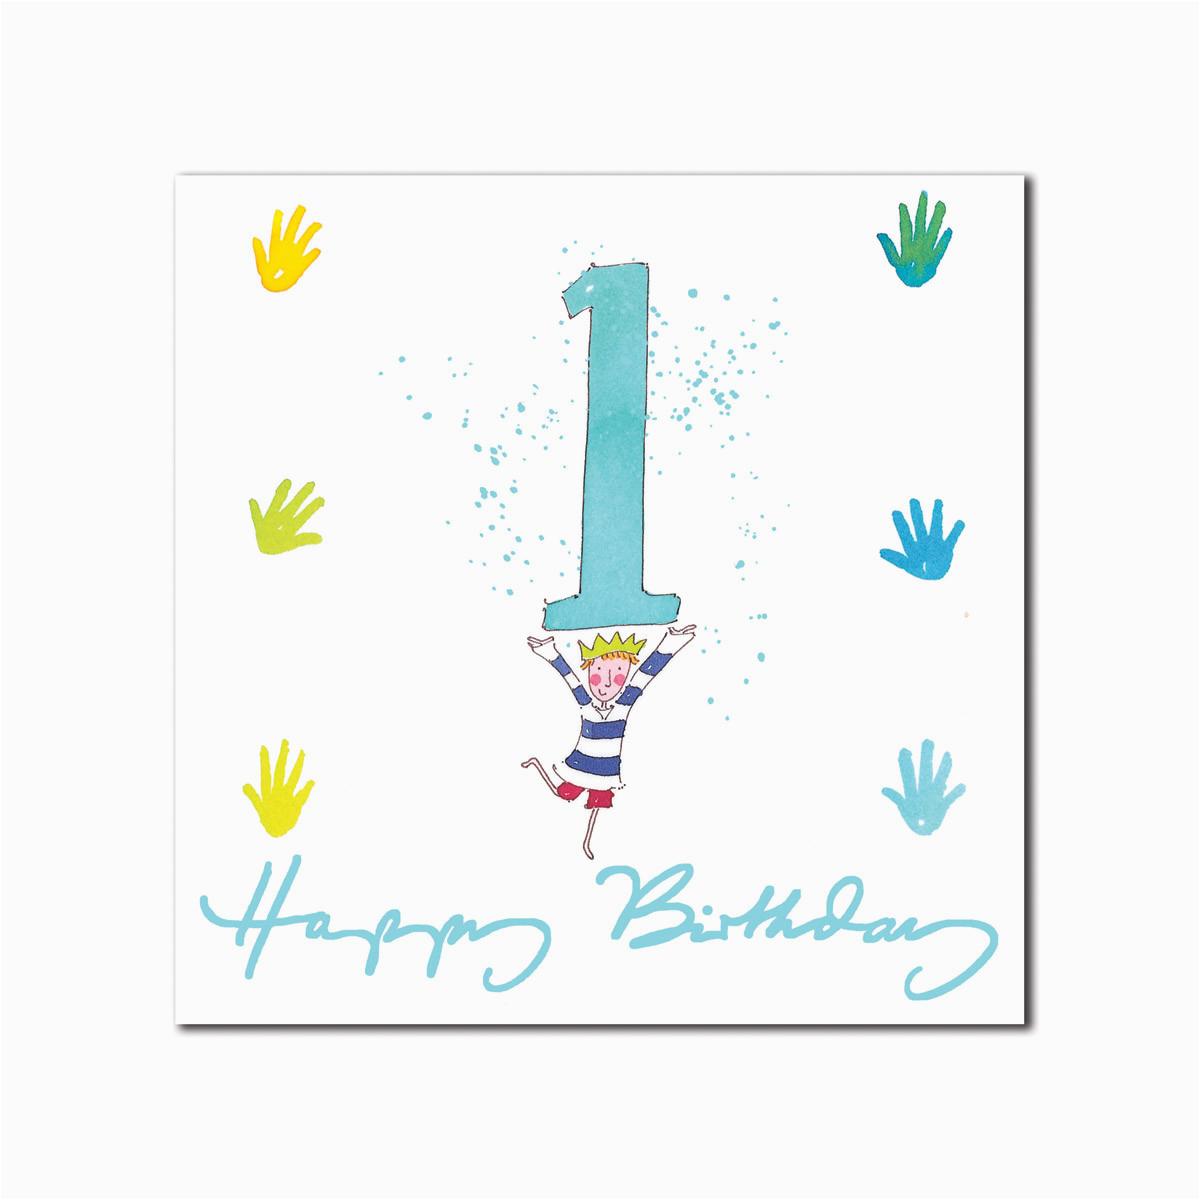 Happy 1st Birthday Boy Card Happy 1st Birthday Boy Greeting Card From sophie Allport